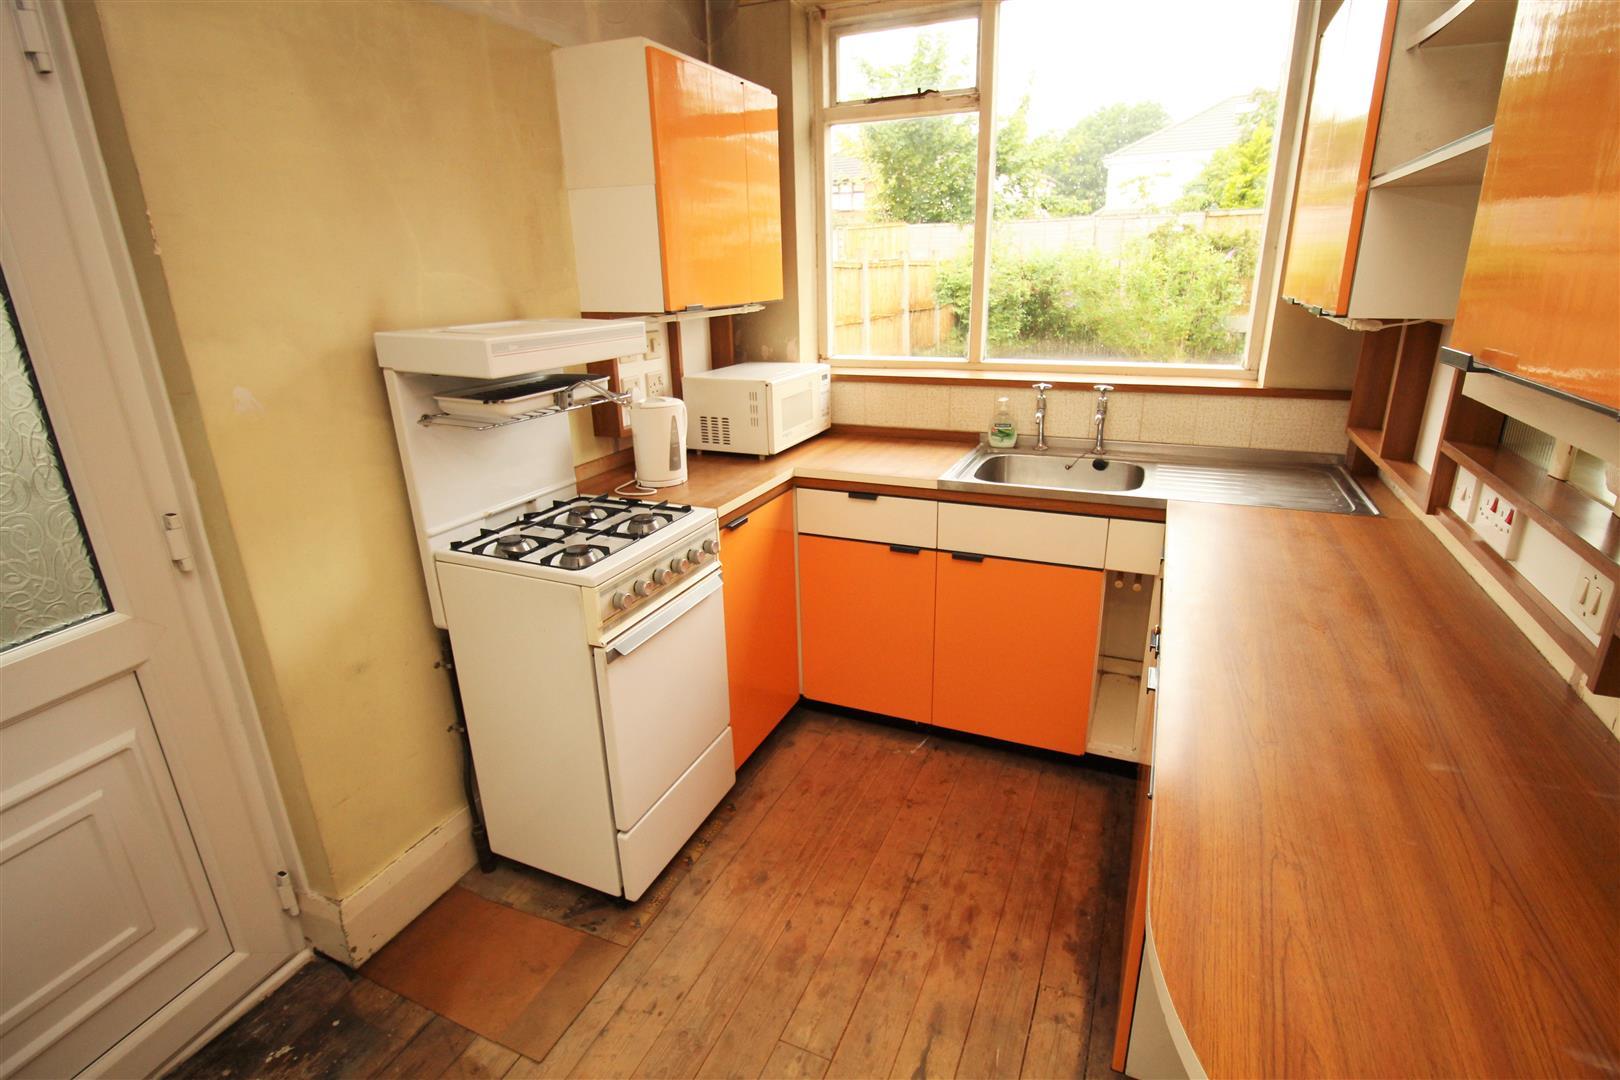 3 Bedrooms, House - Semi-Detached, Bradfield Avenue, Liverpool